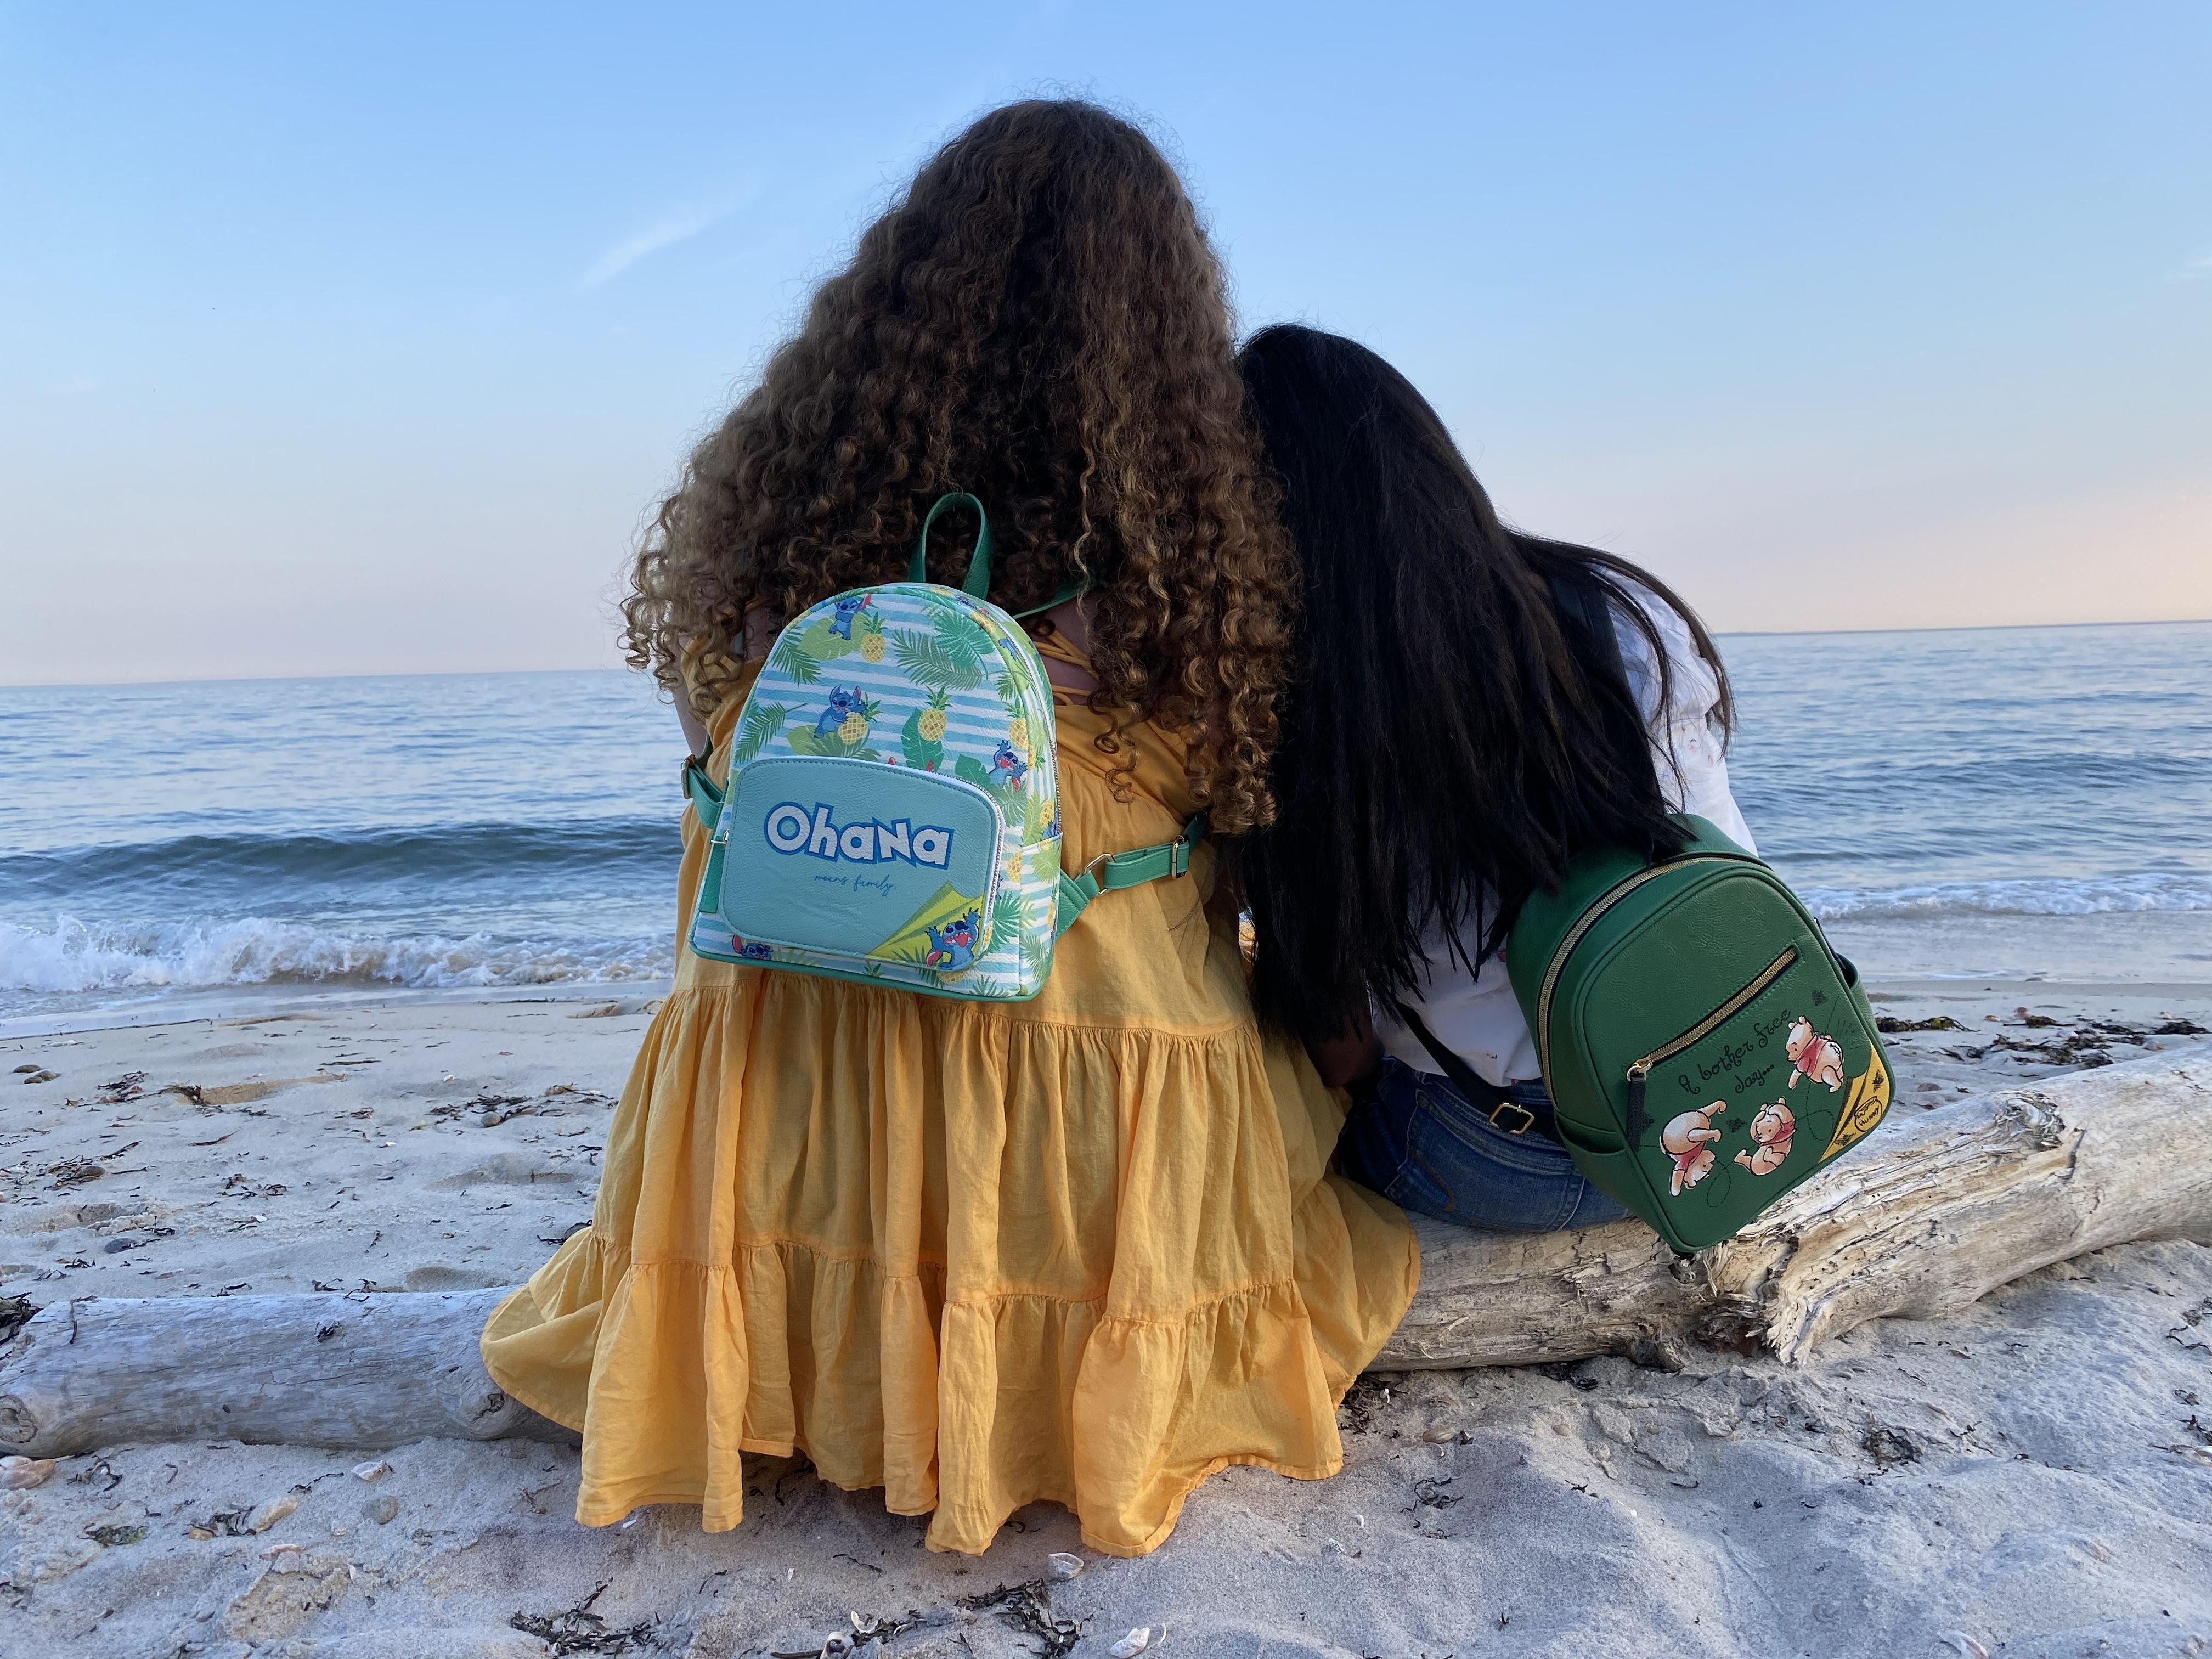 Dani by Danielle Nicole backpacks depict Disney characters.